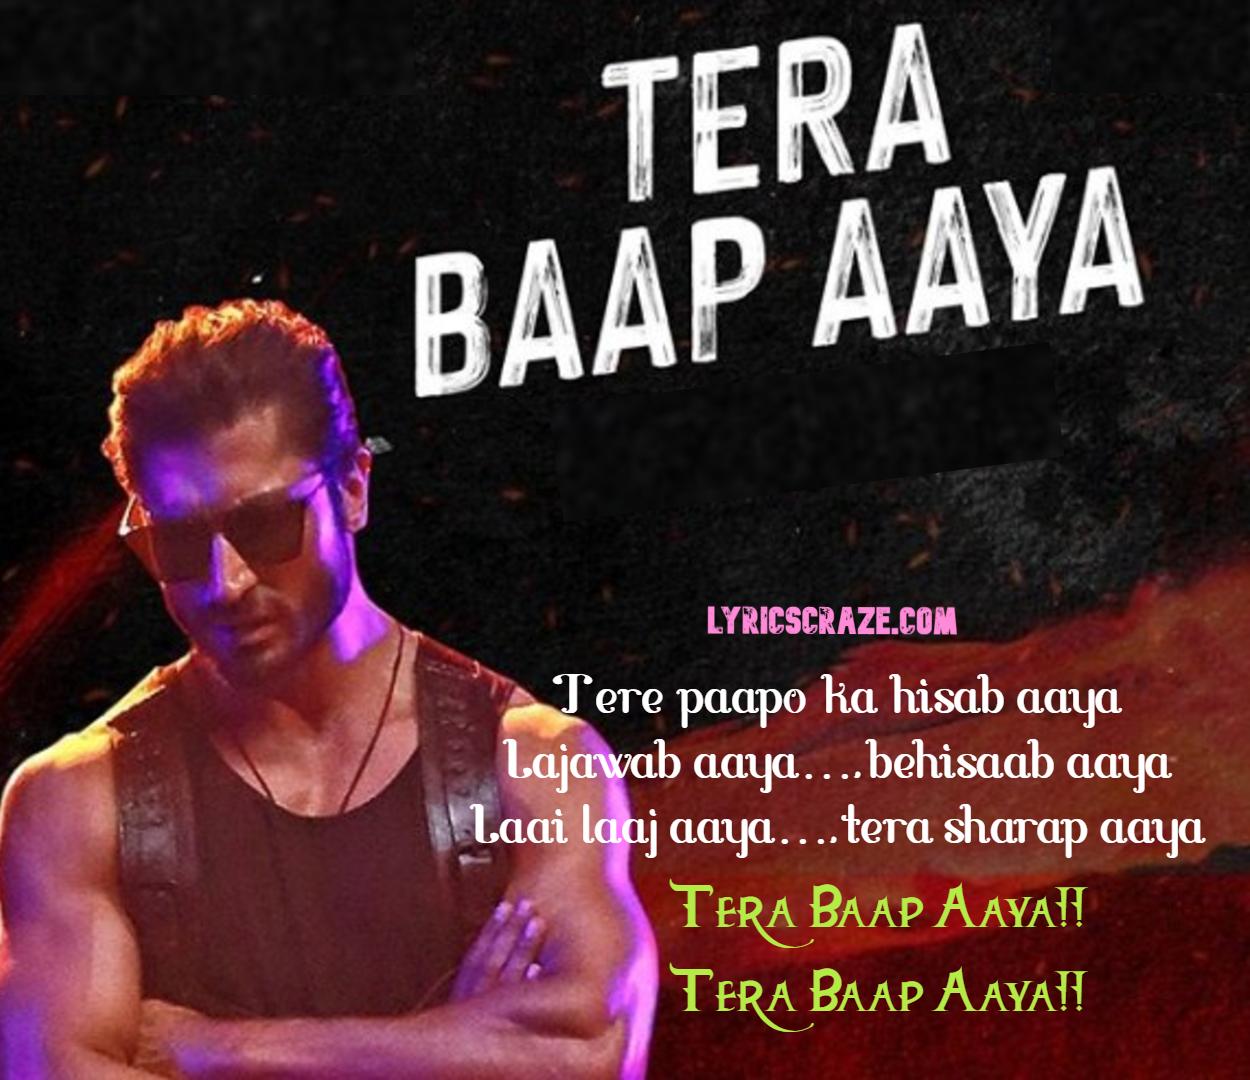 Tera Baap Aaya Lyrics In English Hindi Commando 3 2019 Songs Lyrics Song Lyrics